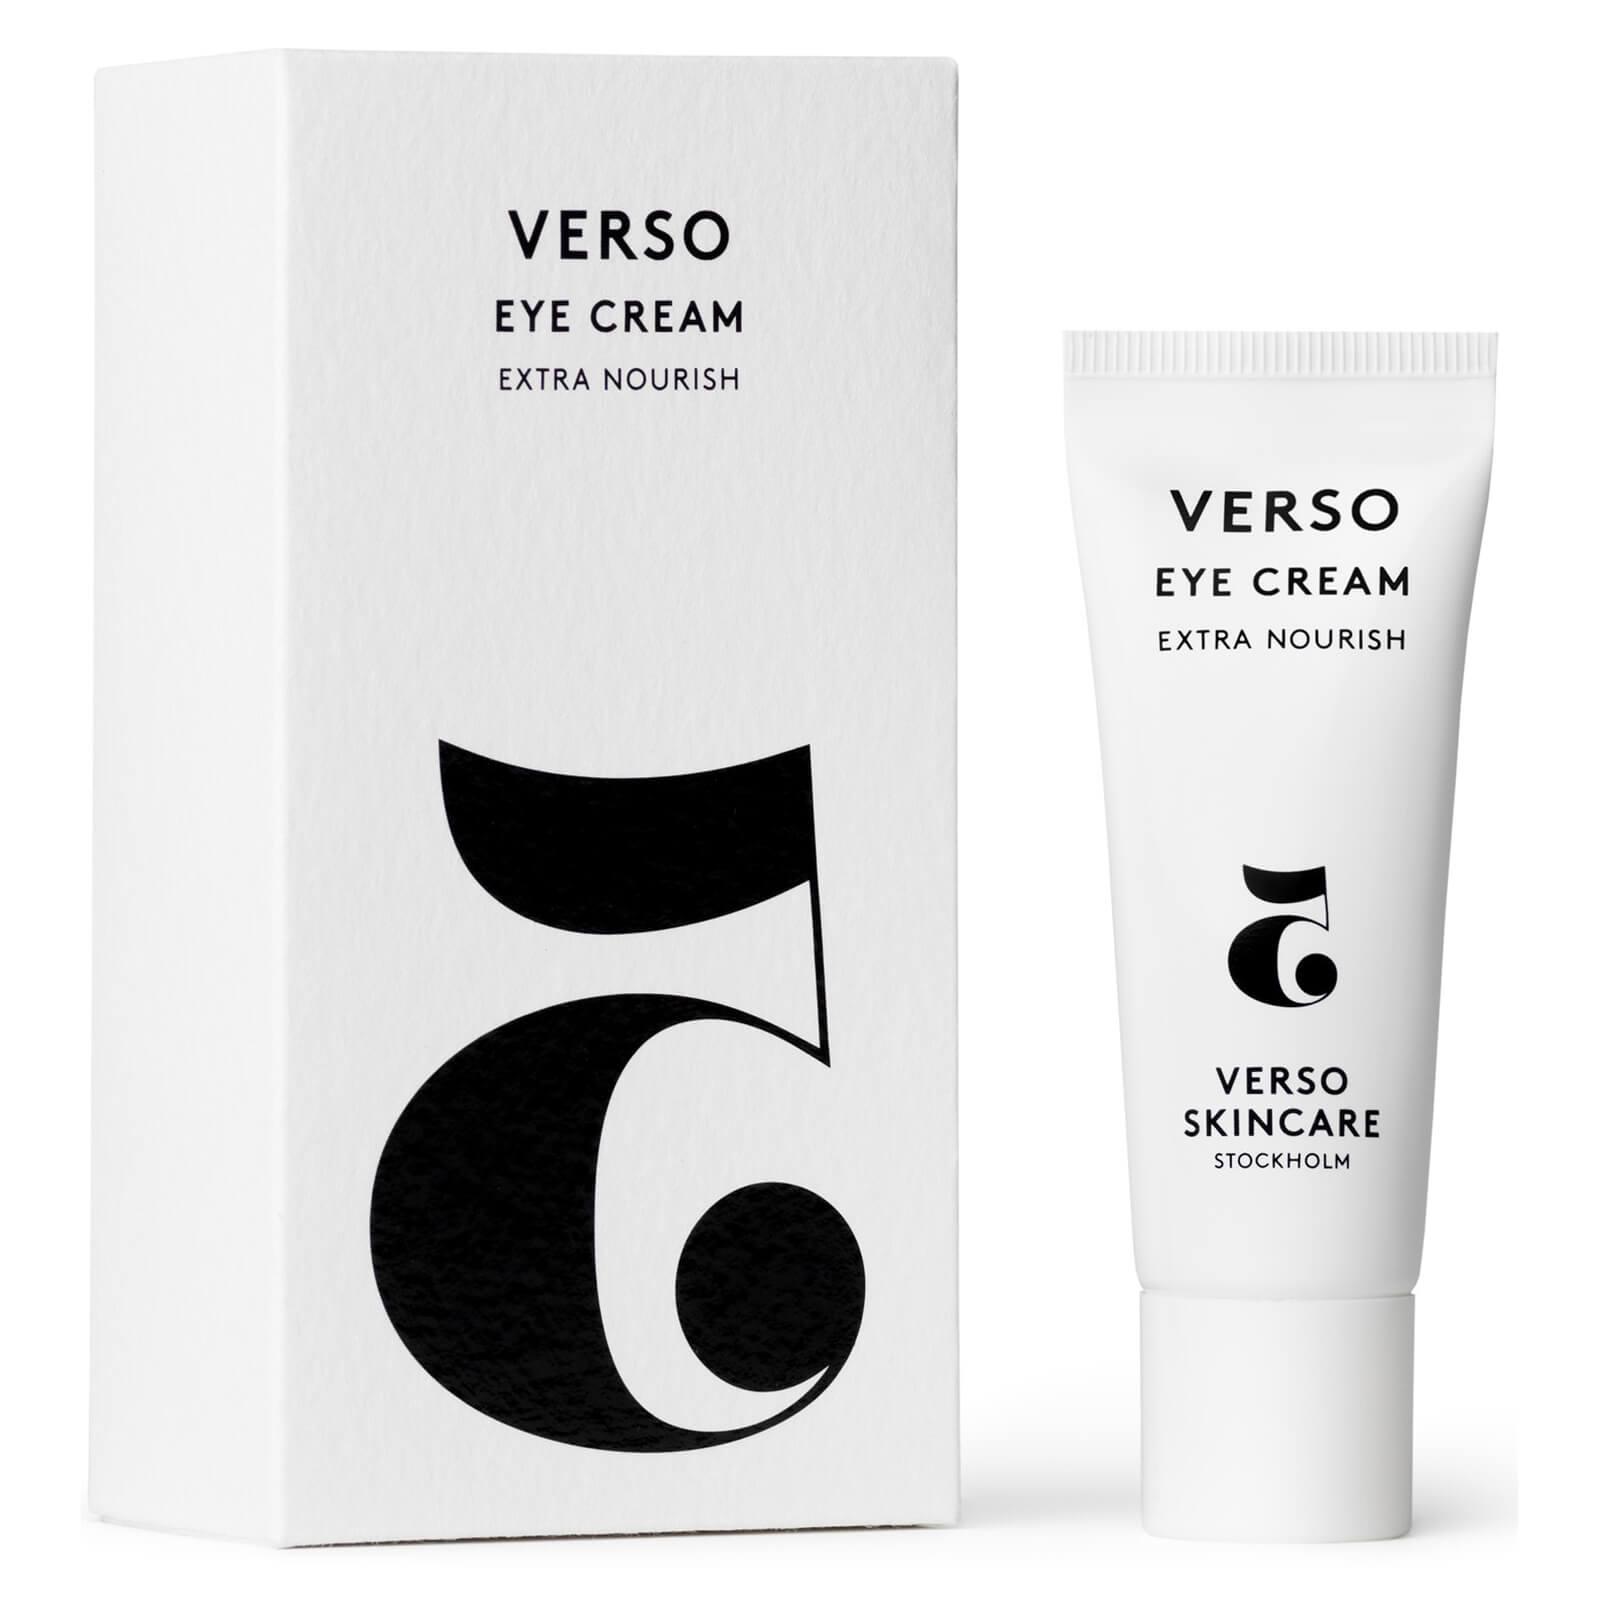 VERSO Eye Cream 20ml